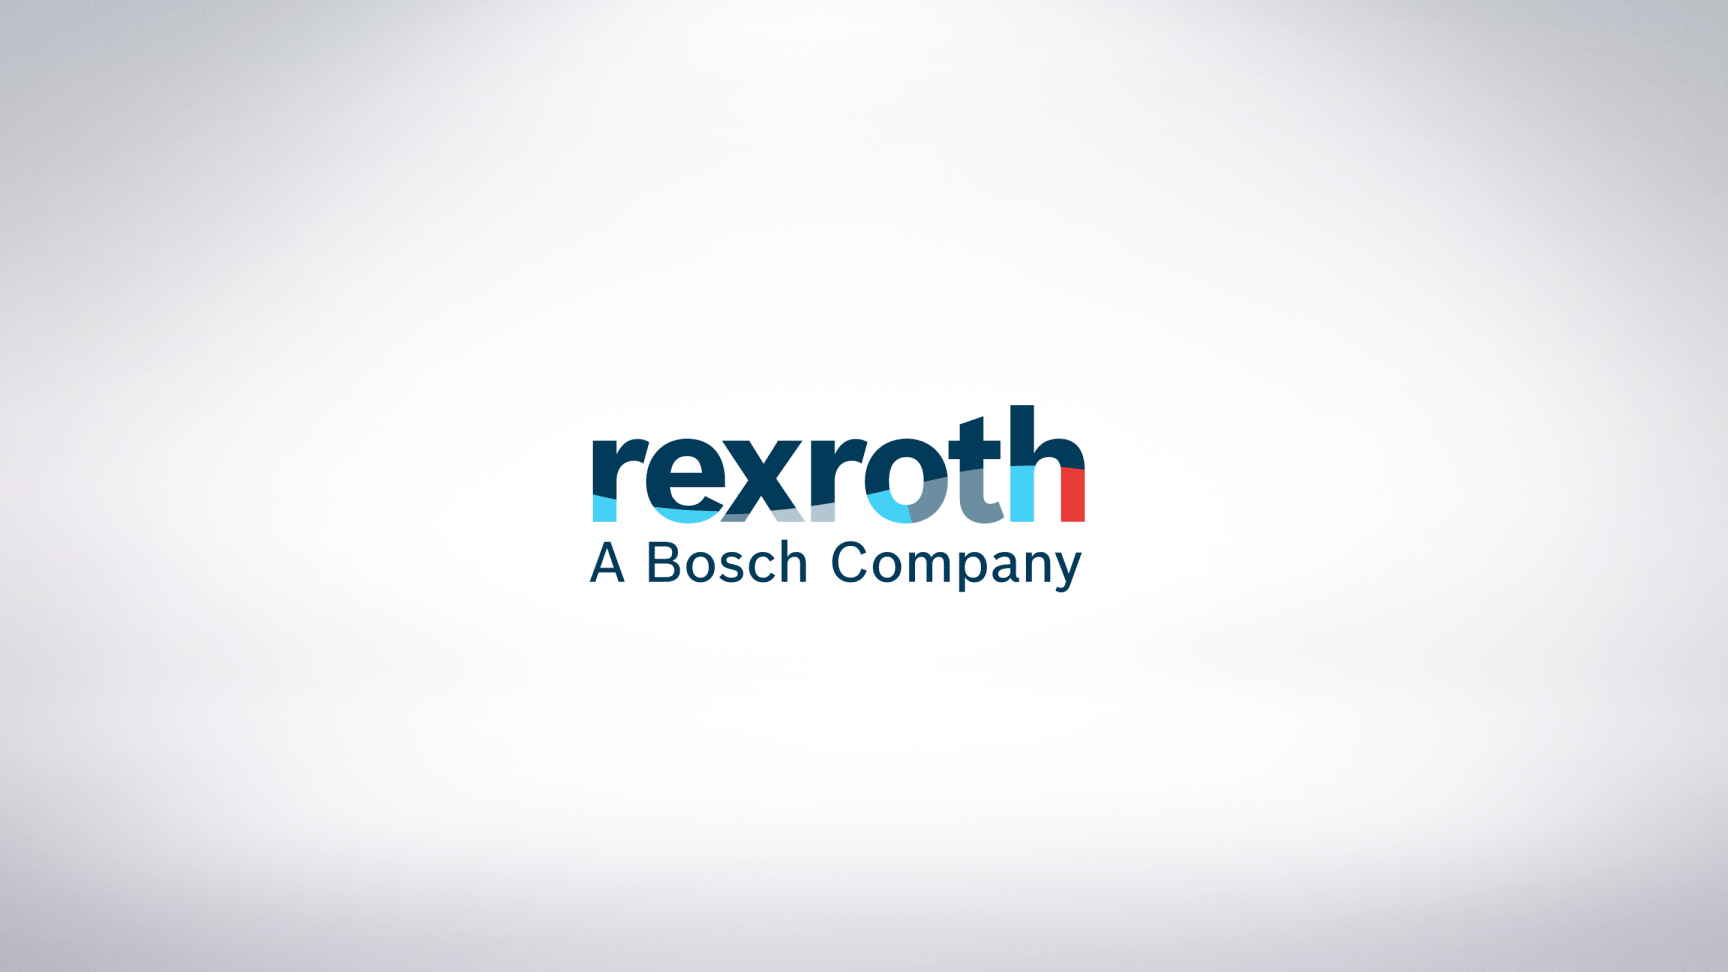 Rexroth Corporate Design